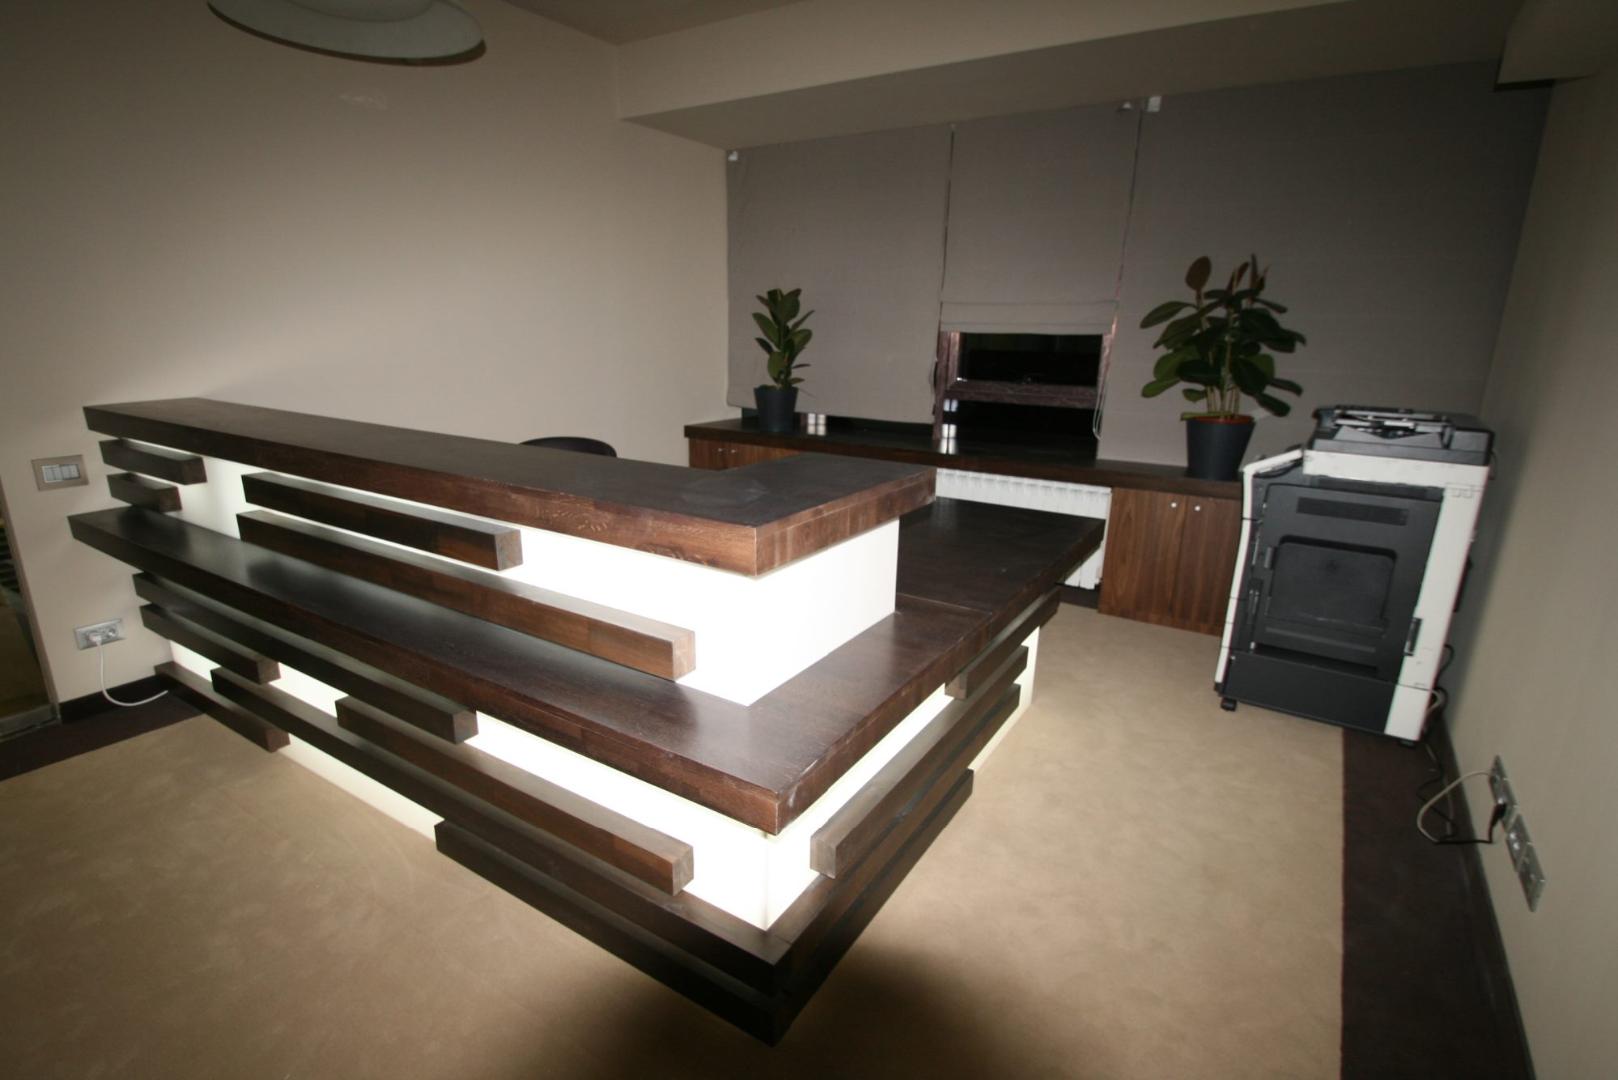 placari pereti corian iluminat led receptie corian termoformat furnir tavan furnir nuc tridimensional mobilier trafoare atipic depa006